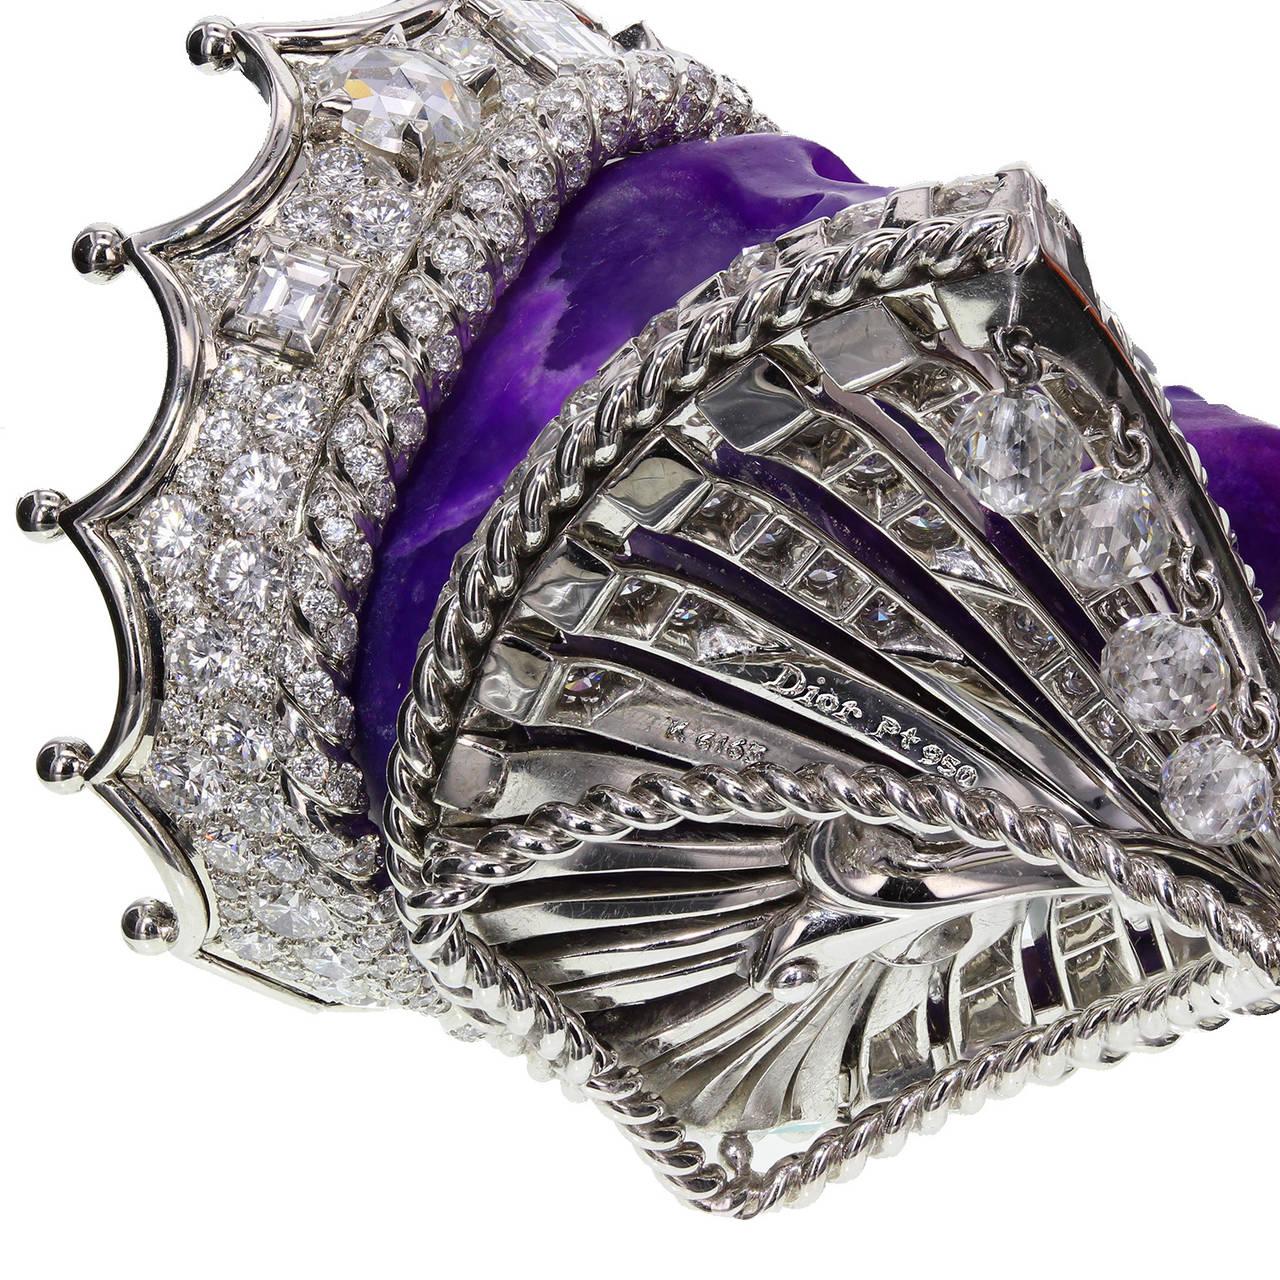 Dior Joaillerie Victoire de Castellane Kings and Queens Roi de Sugilite Pendant 5